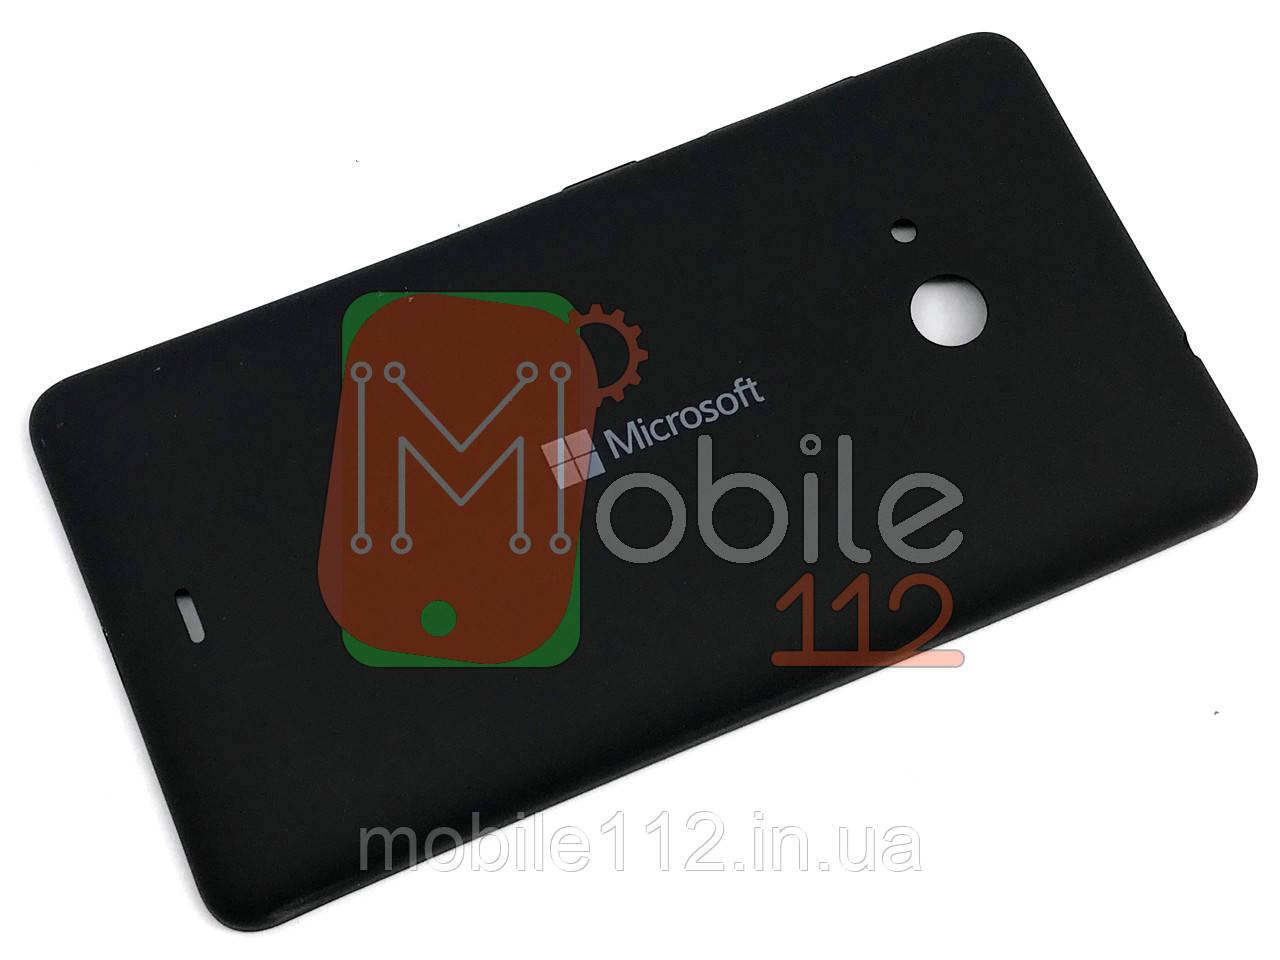 Задняя крышка Microsoft 535 Lumia Dual Sim (RM-1090), черная